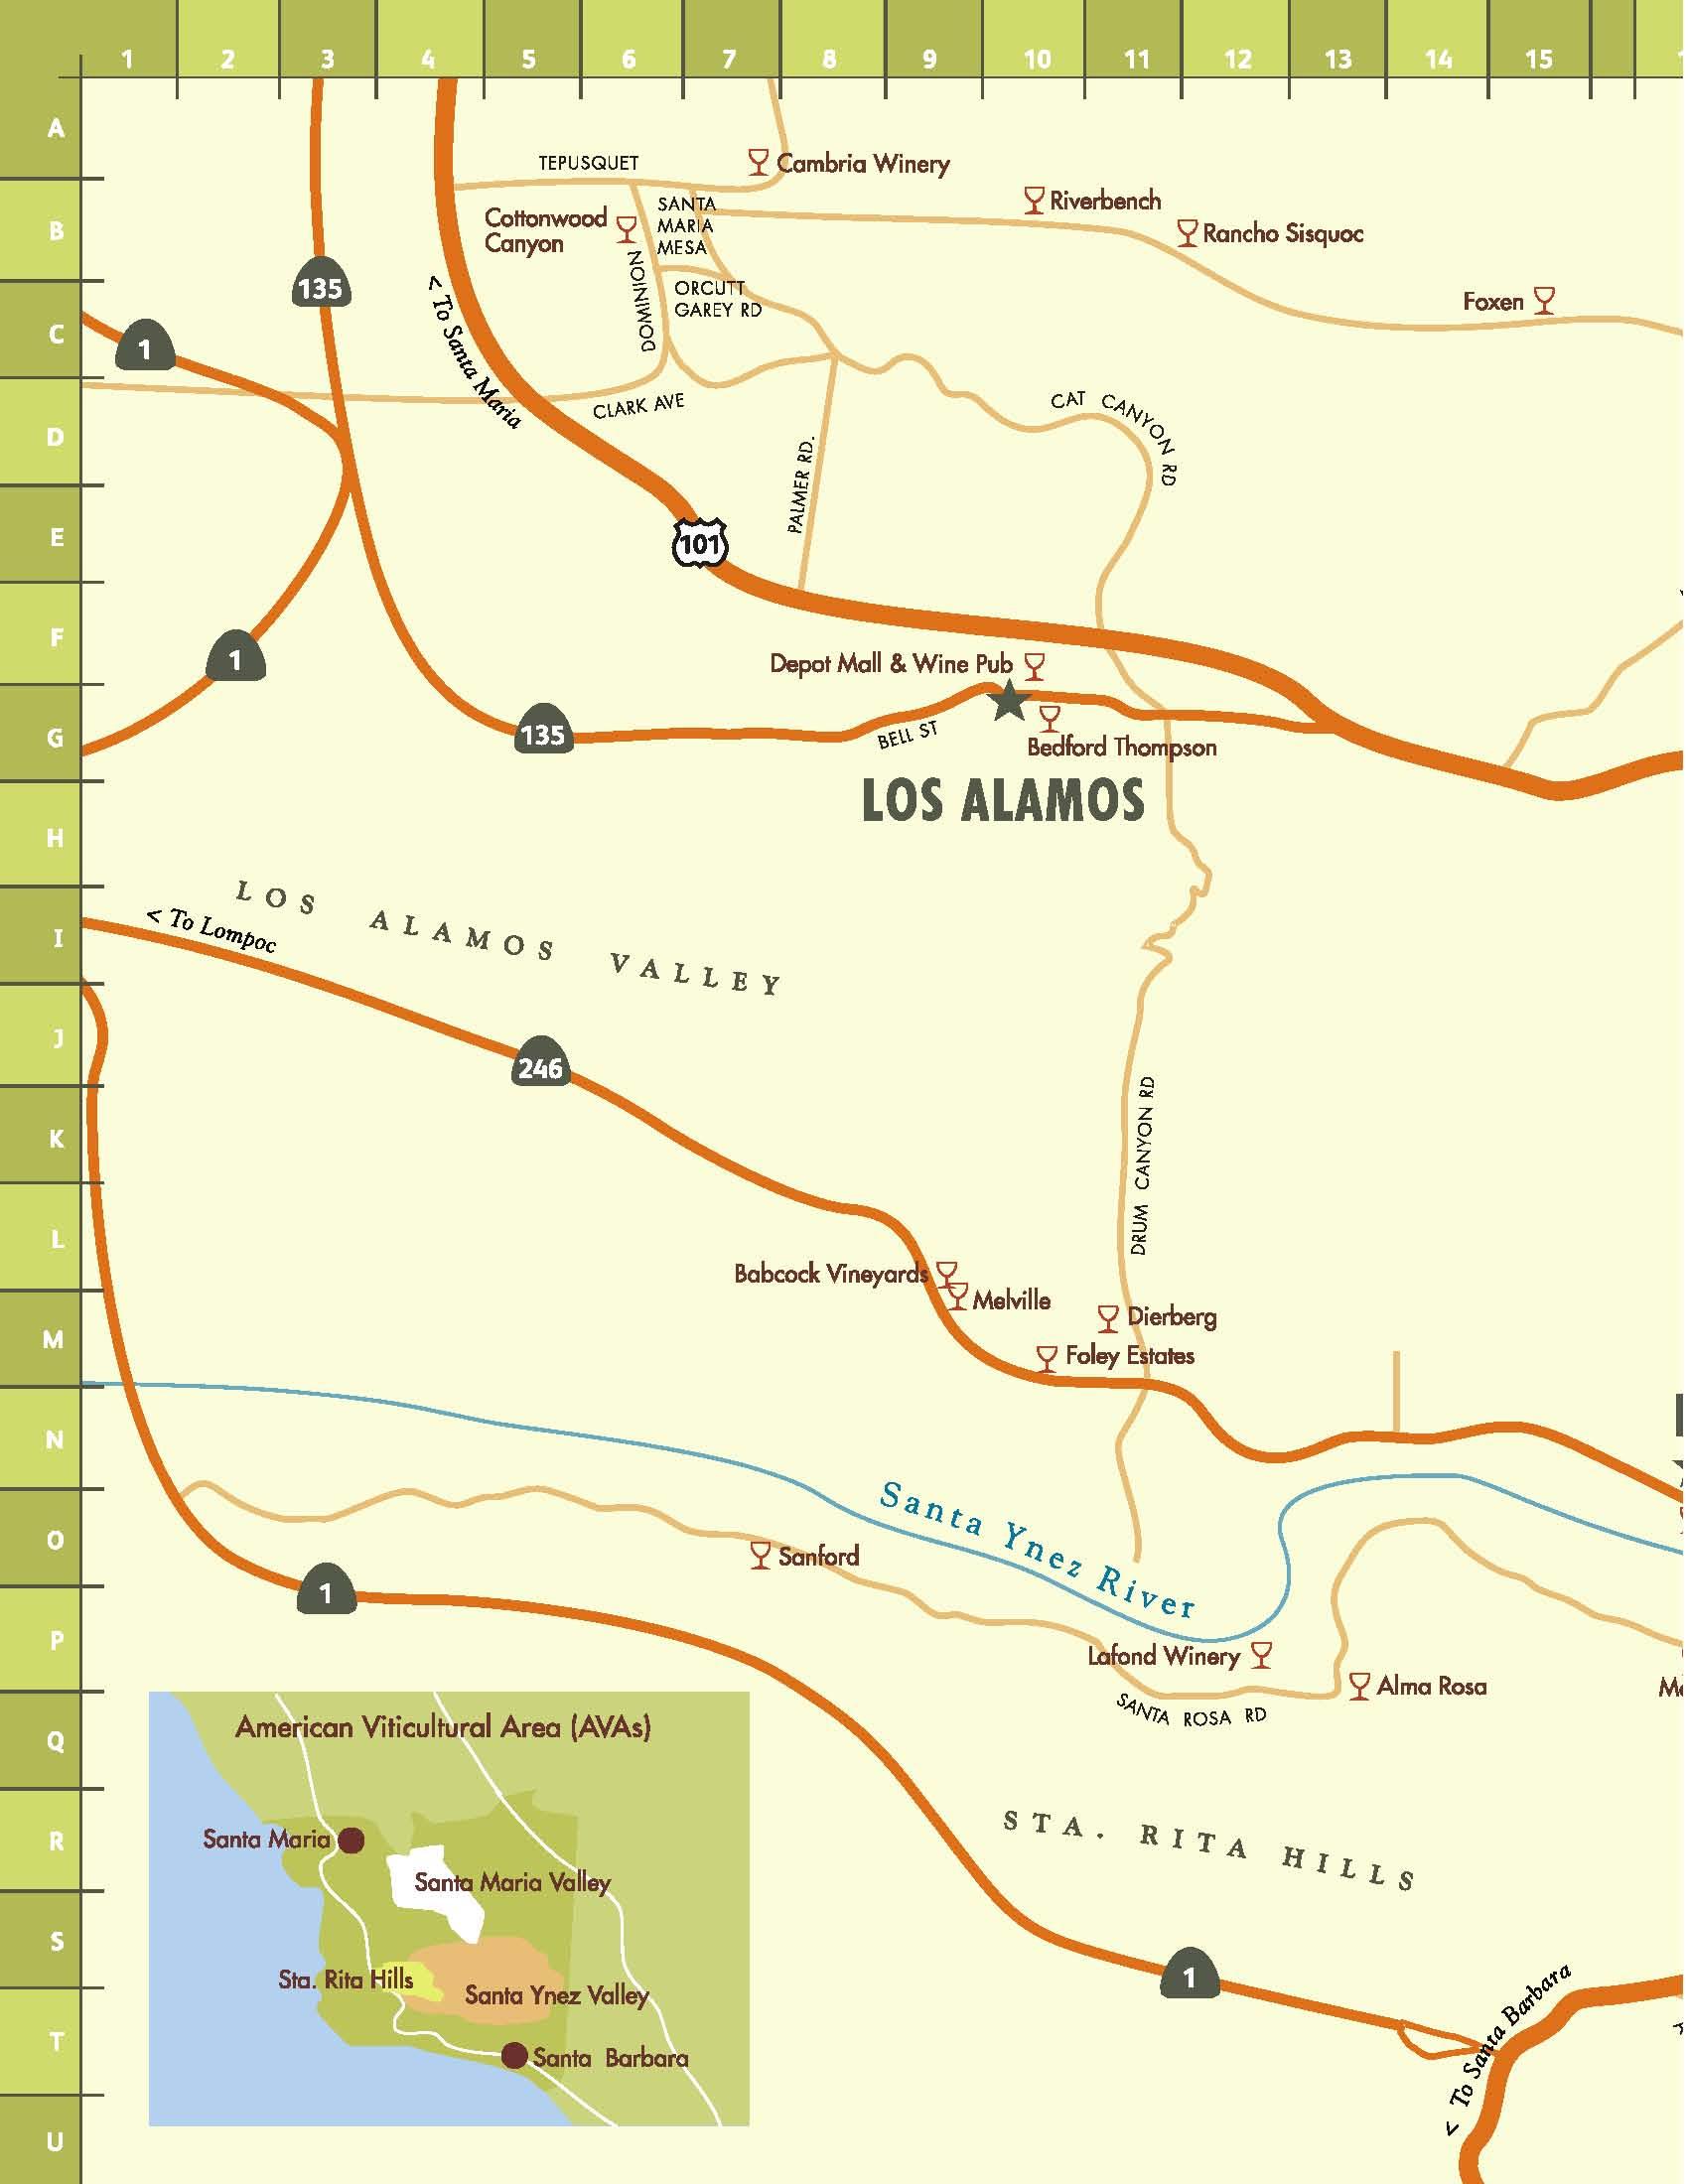 santa-ynez-wine-tasting-map_Page_1 Santa Ynez Winery Map on new hampshire winery map, healdsburg ca winery map, north georgia winery map, woodinville winery map, el dorado county winery map, missouri winery map, san ynez winery map, monterey winery map, ohio winery map, willamette valley winery map, los olivos wine map, solvang wine map, ramona winery map, southern arizona winery map, buellton winery map, paso robles winery map, healdsburg area winery map, san luis obispo winery map, ojai winery map, central coast winery map,